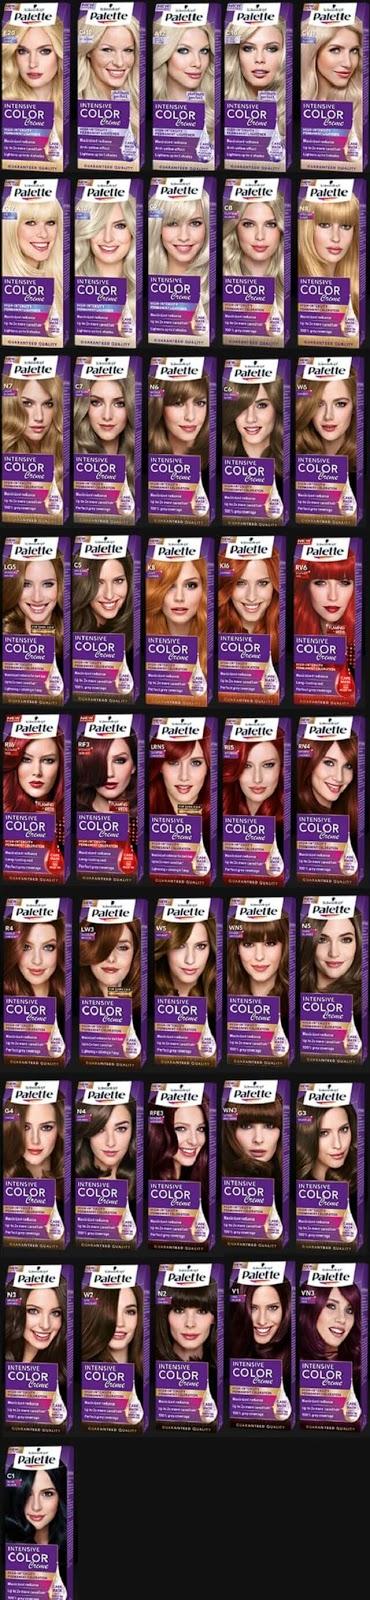 Palette intensive color creme  saç renk kodları